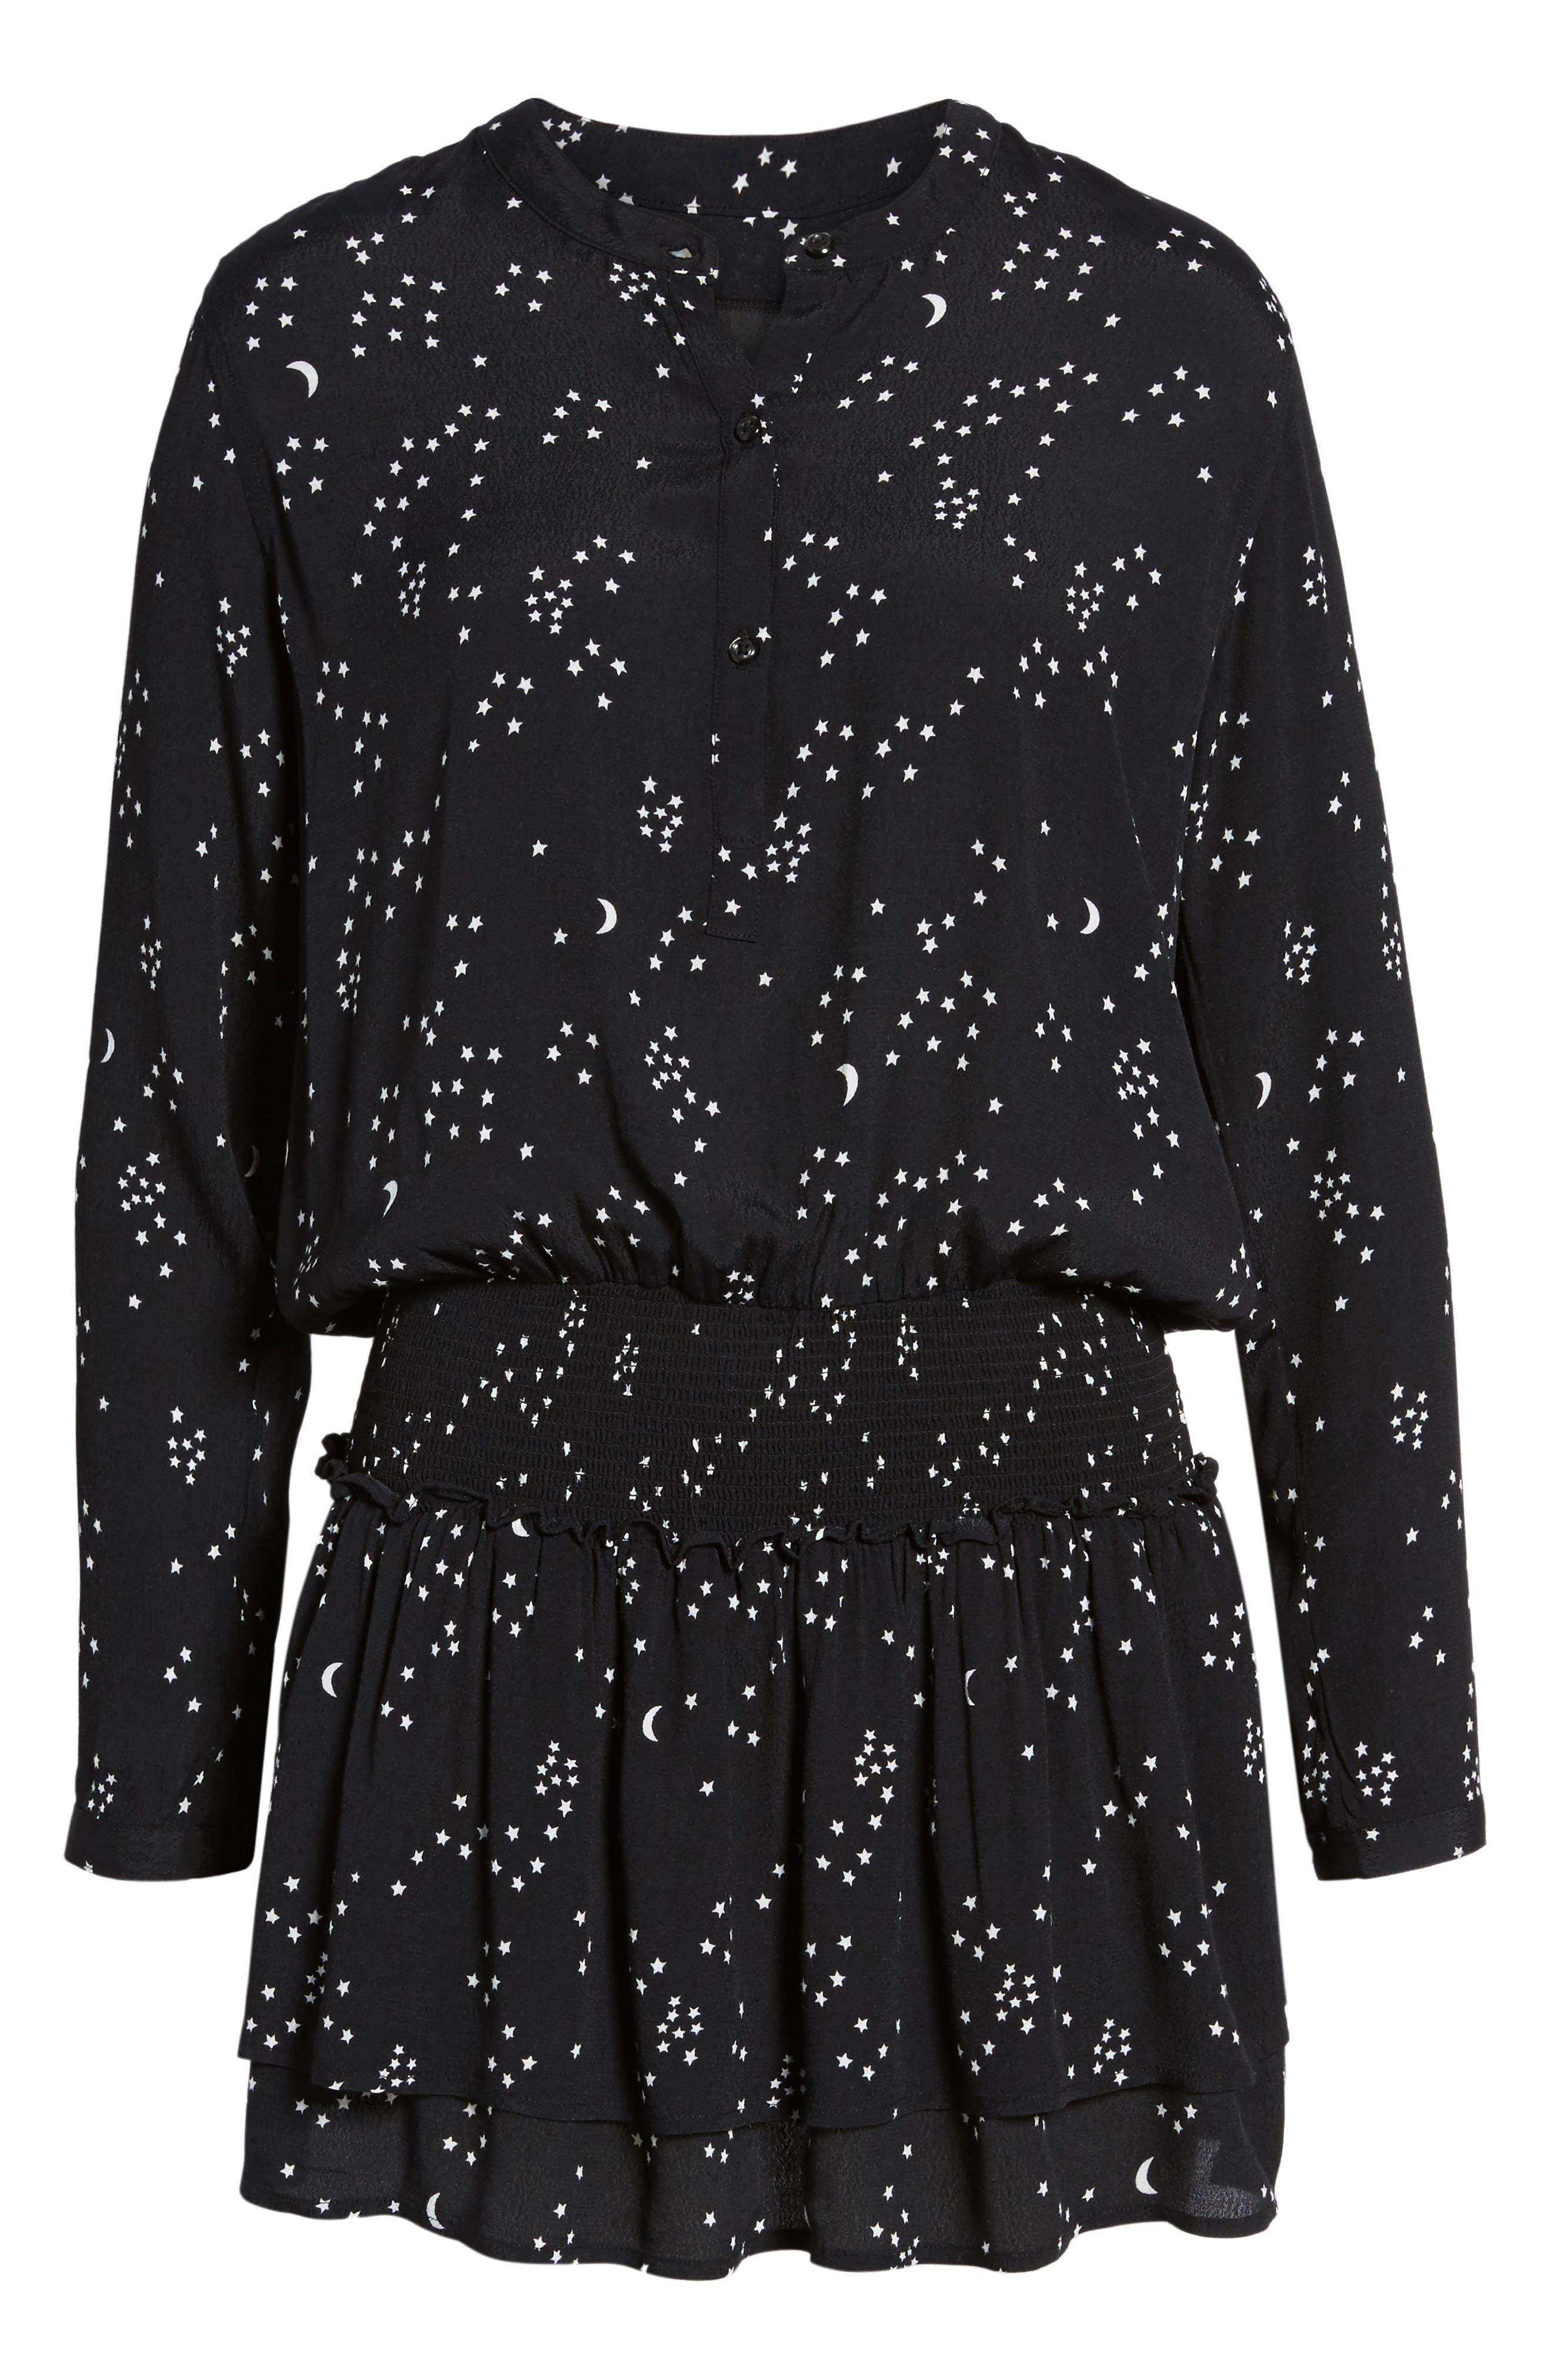 Cleo Dress,                             Alternate thumbnail 6, color,                             402